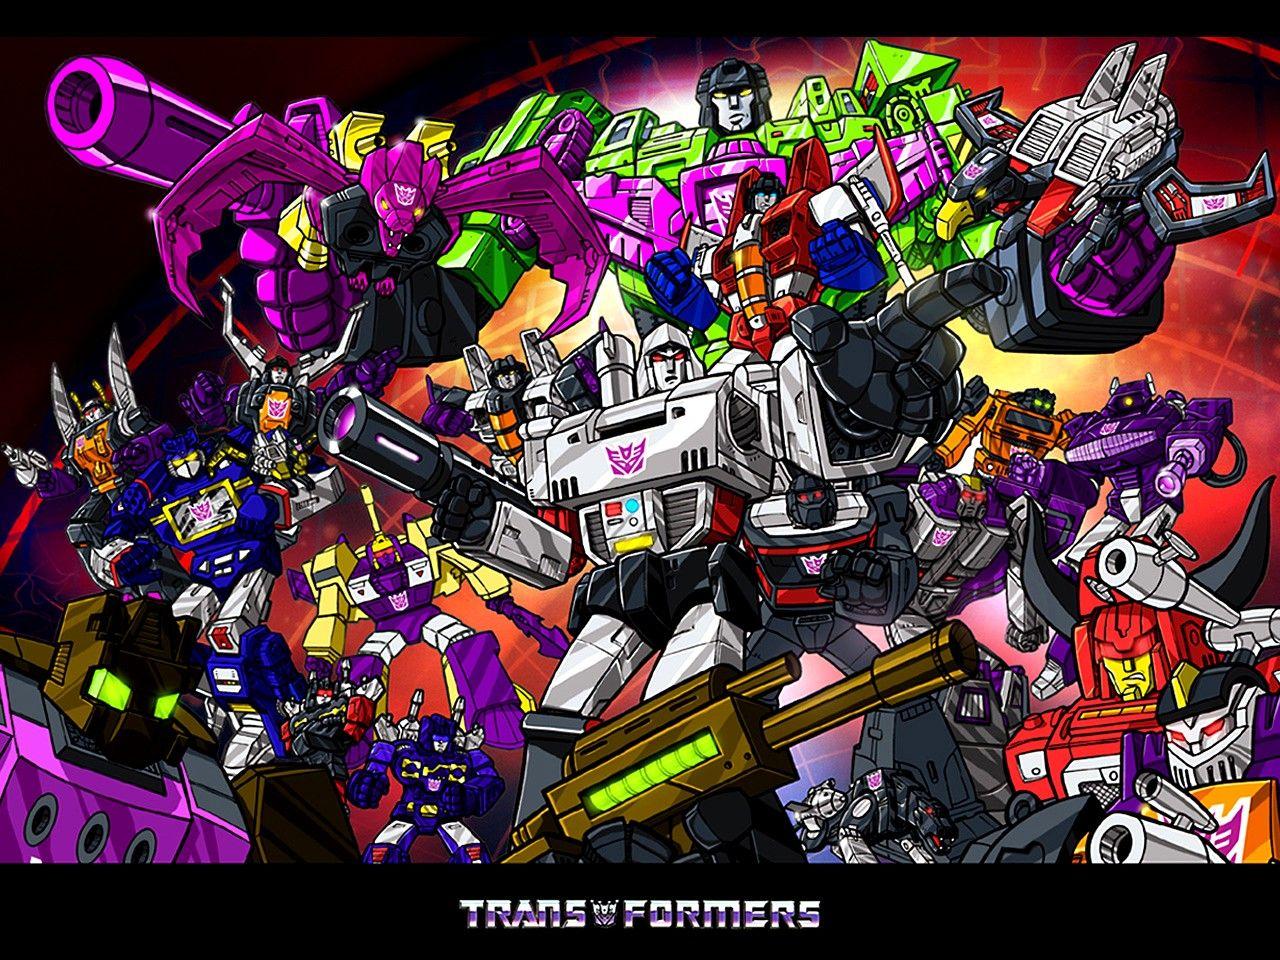 Transformers G1 Wallpapers Decepticons Transformers Transformers Art